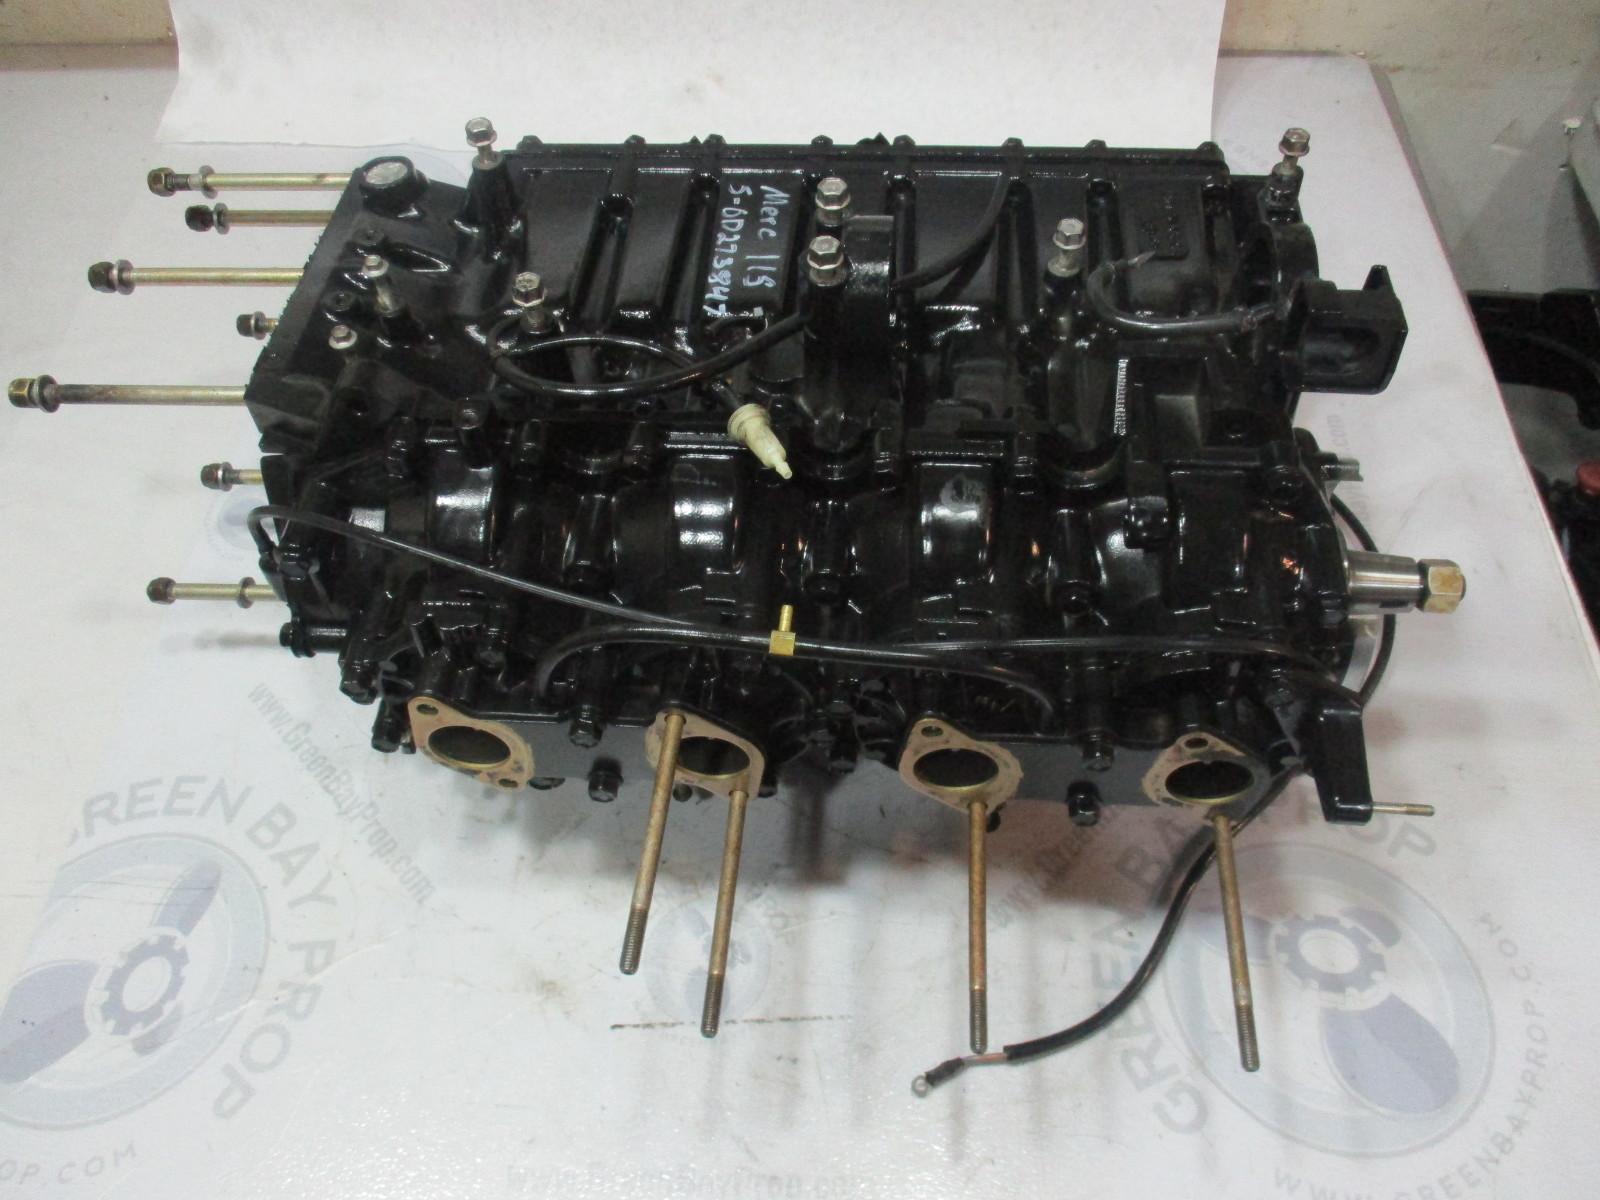 17791A92 Mercury Mariner 100 115 Hp 4 Cyl  Complete Powerhead Engine Block